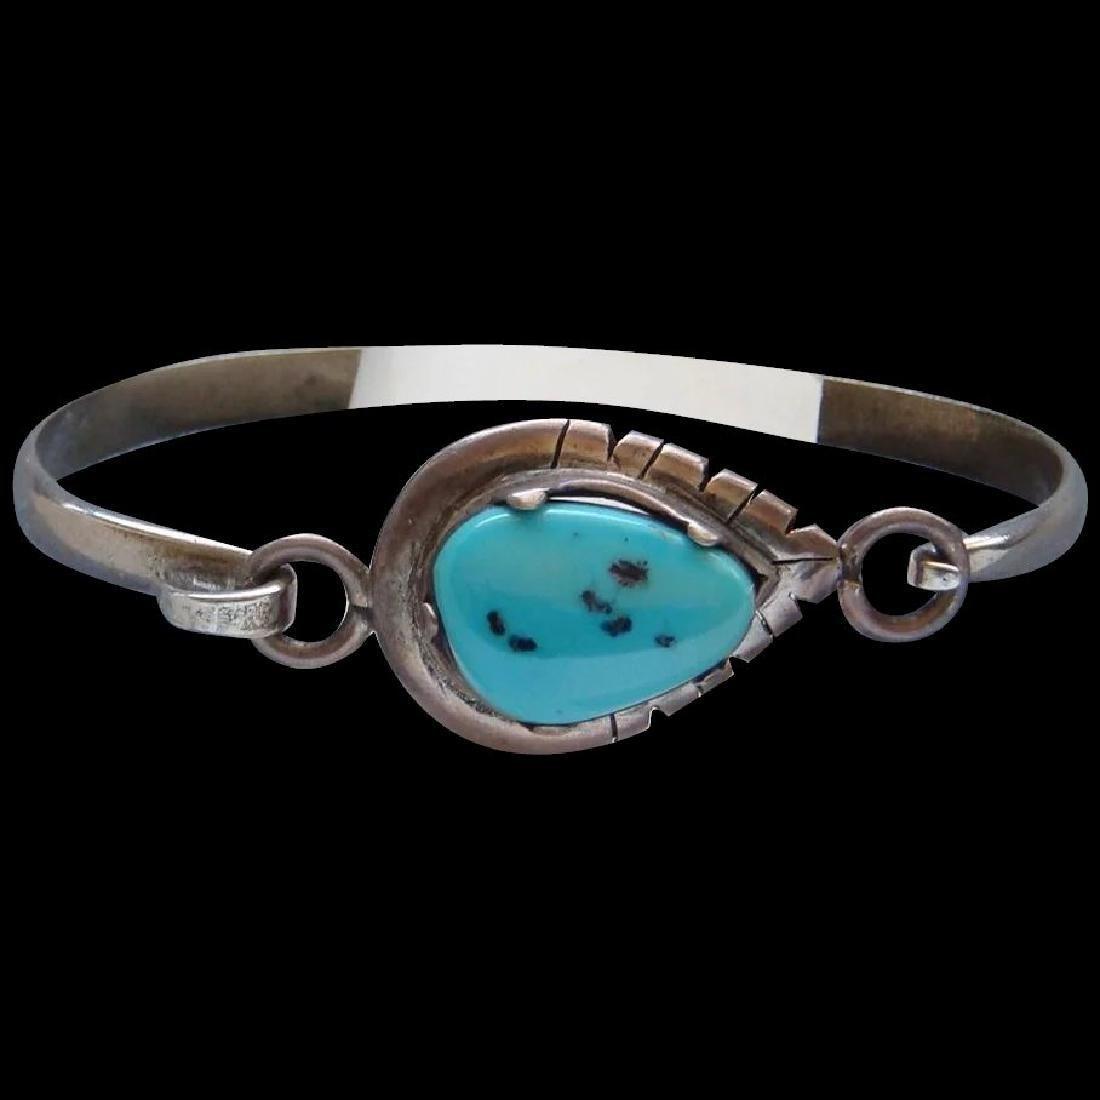 Vintage Sterling Silver Kingman Turquoise Bracelet